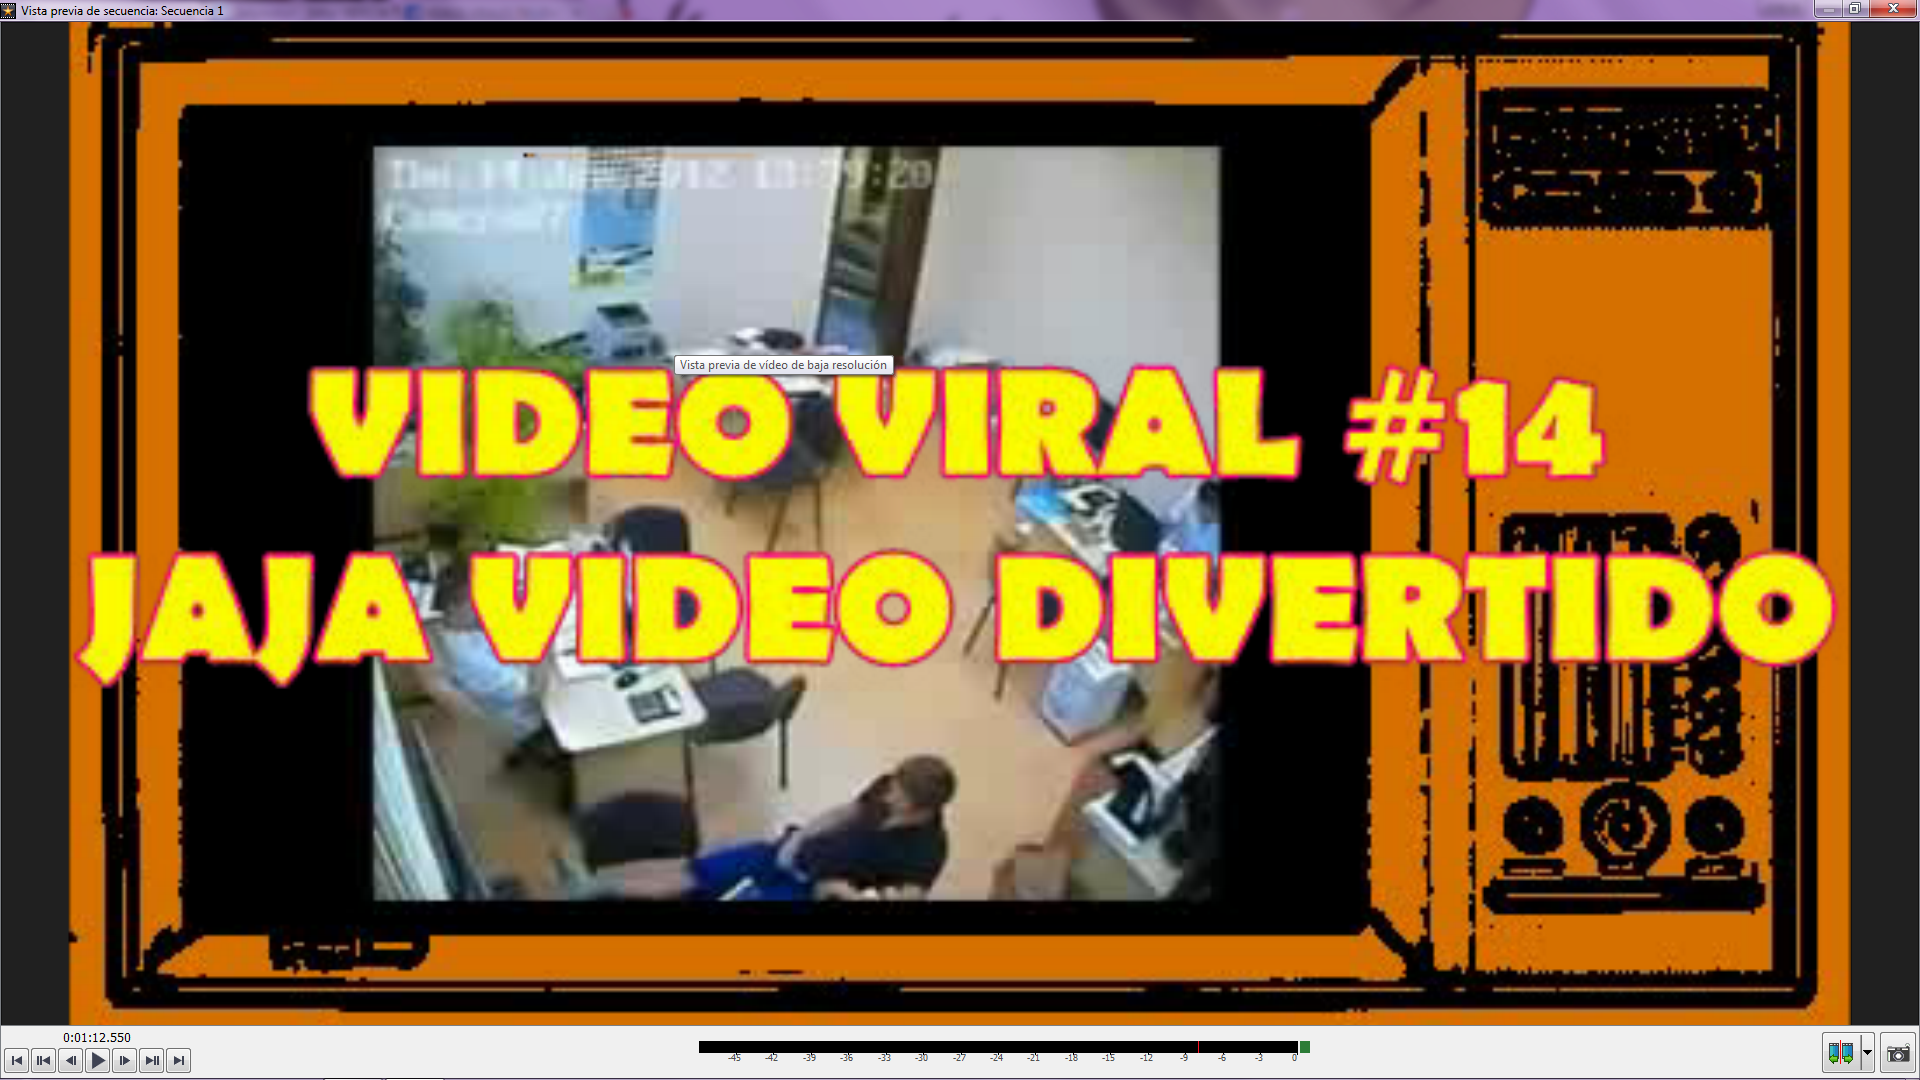 VIDEO VIRAL #14, videos virales, videos de caidas, videos chistosos,videos de risa, videos de humor,videos graciosos,videos mas vistos, funny videos,videos de bromas,videos insoliyos,fallen videos,viral videos,videos of jokes,Most seen,